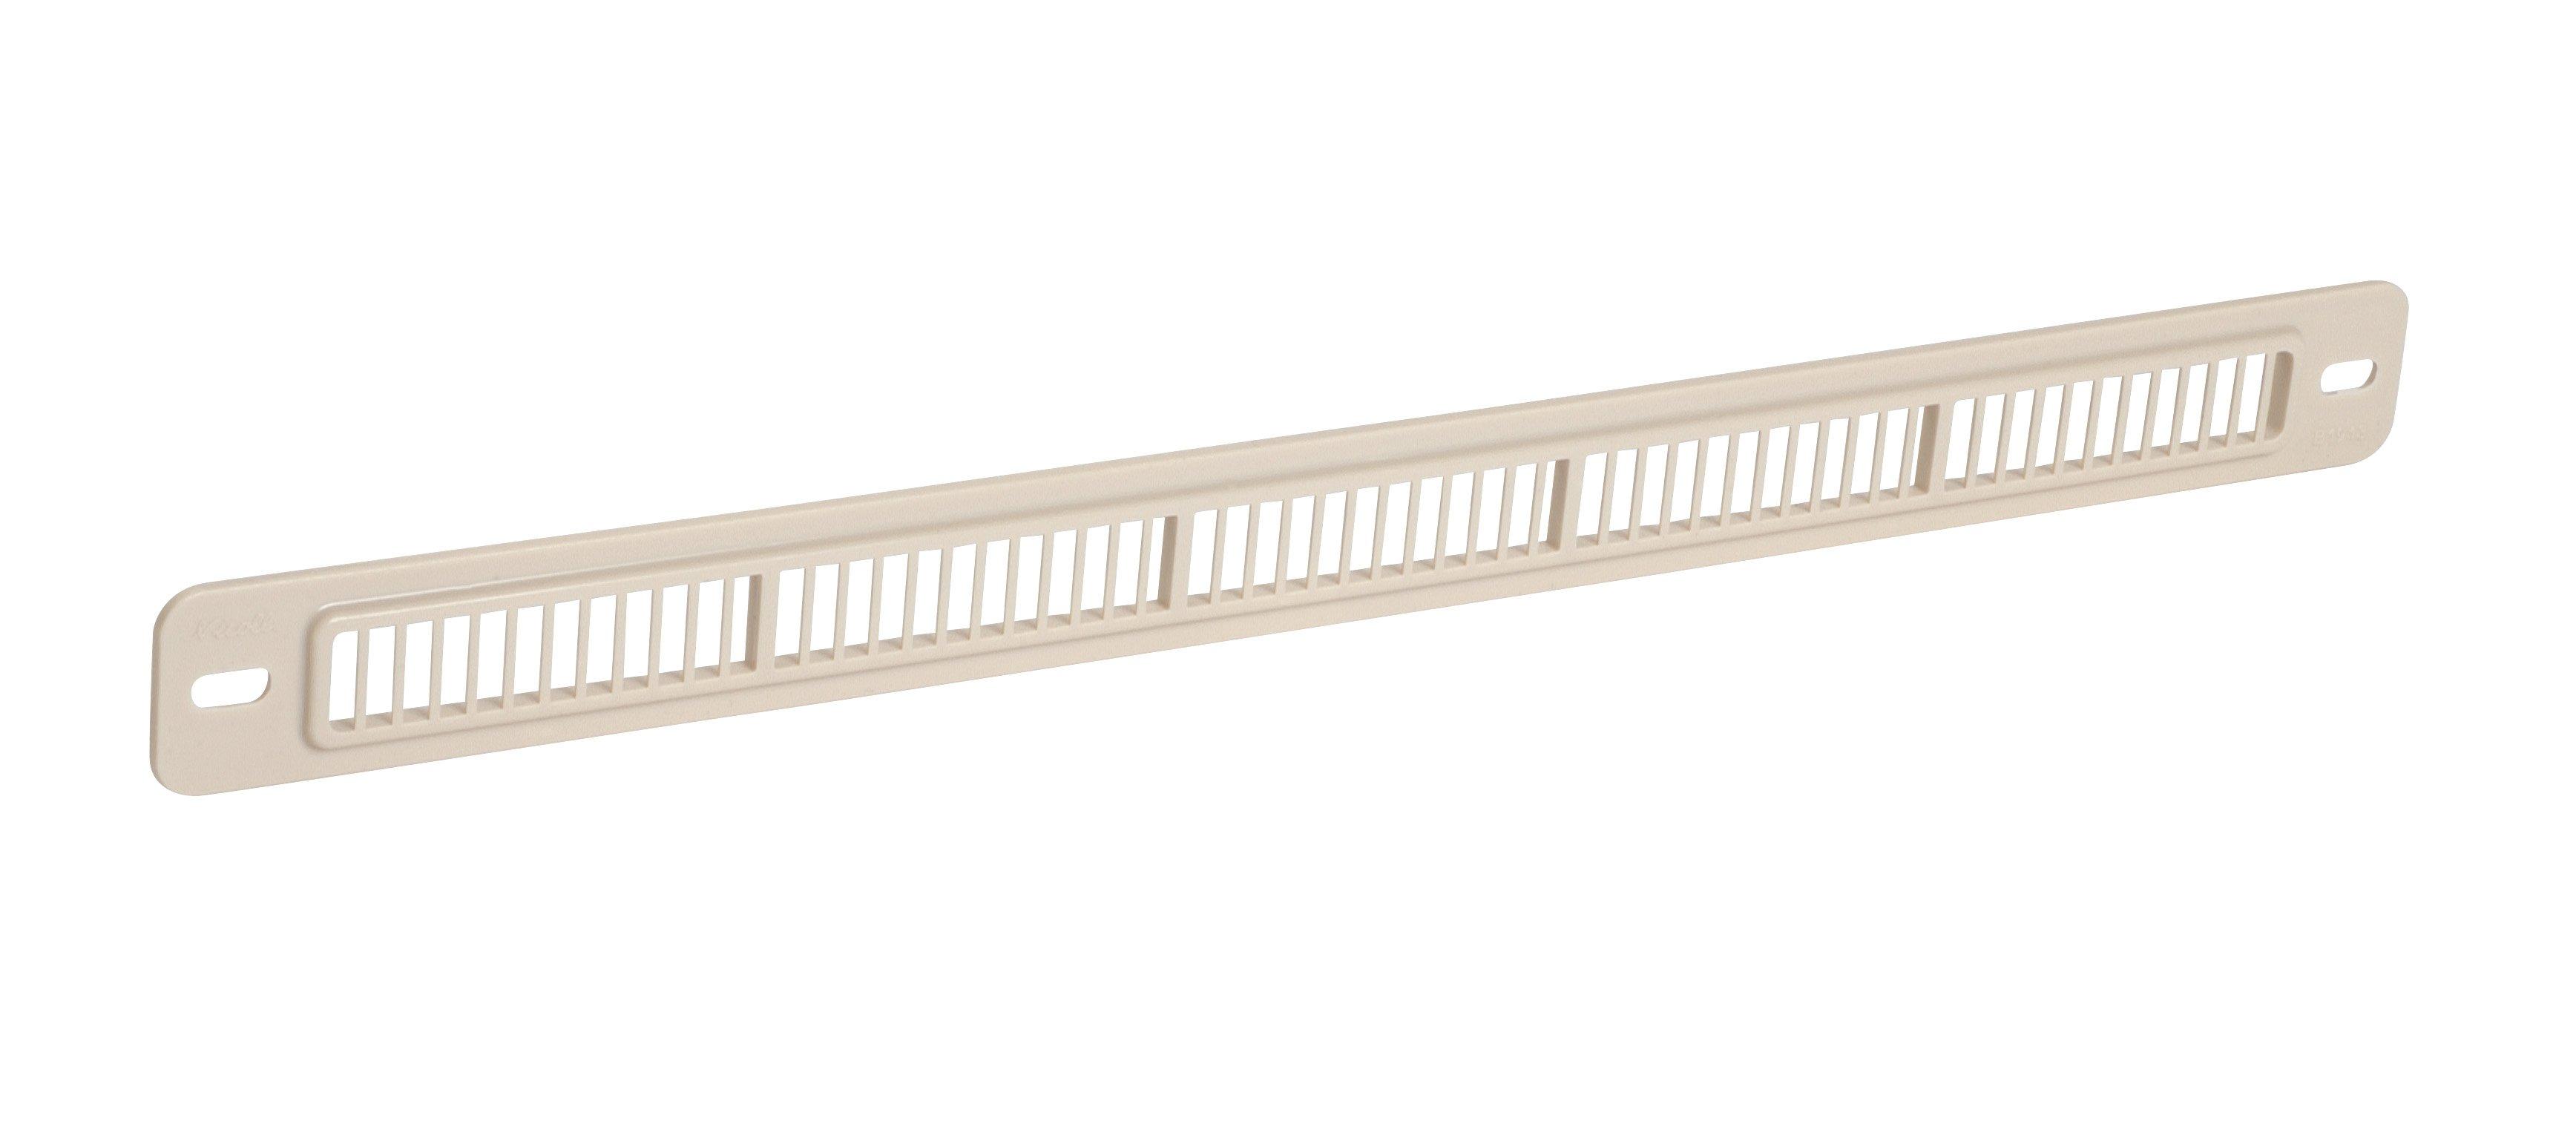 grille plate pour entr e d 39 air autor glable nicoll. Black Bedroom Furniture Sets. Home Design Ideas